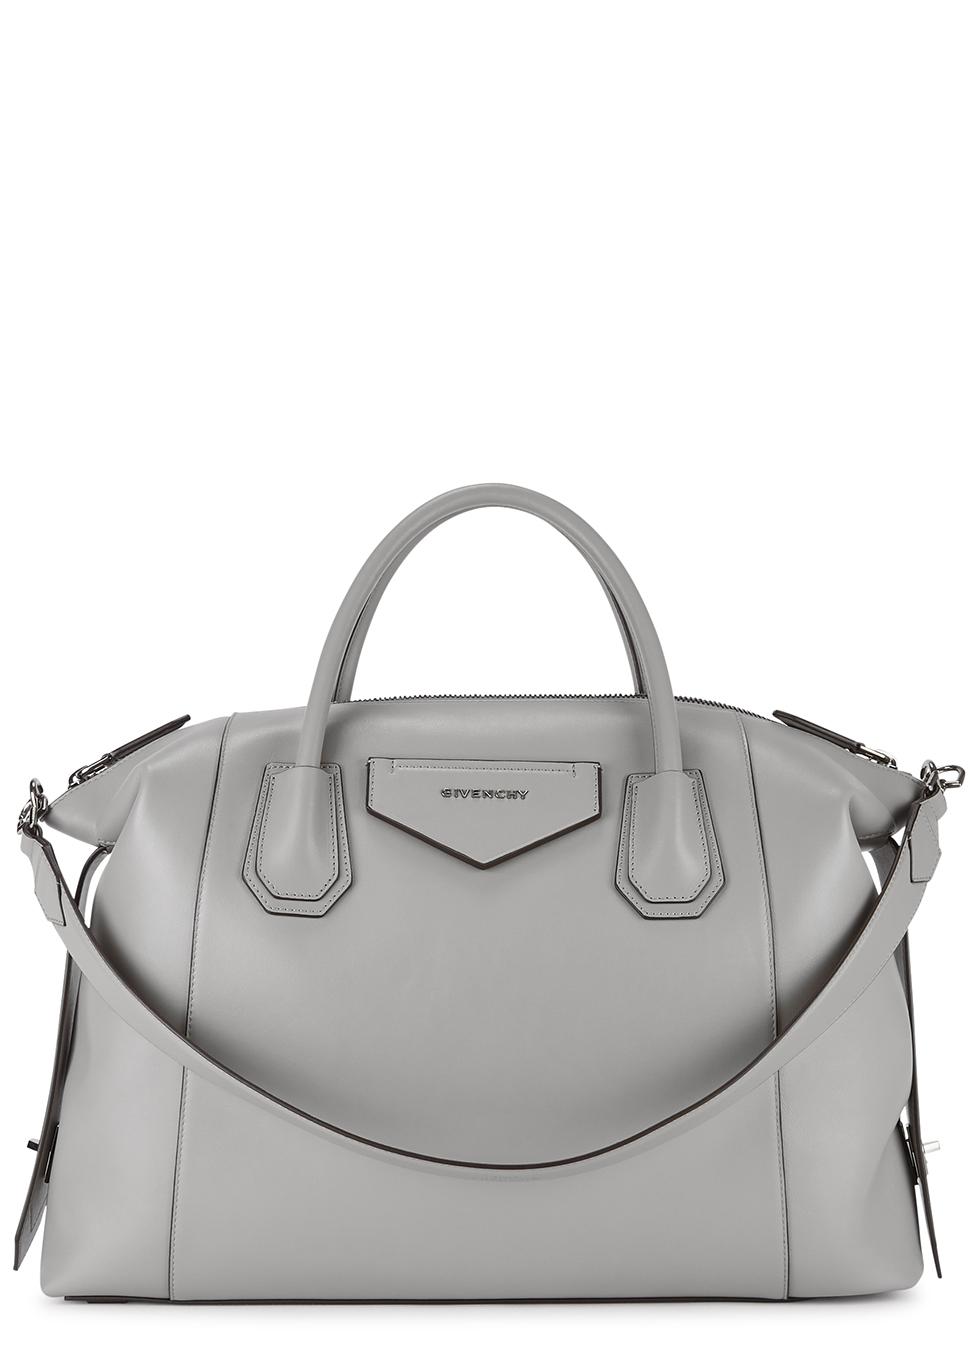 Antigona Soft medium grey leather tote